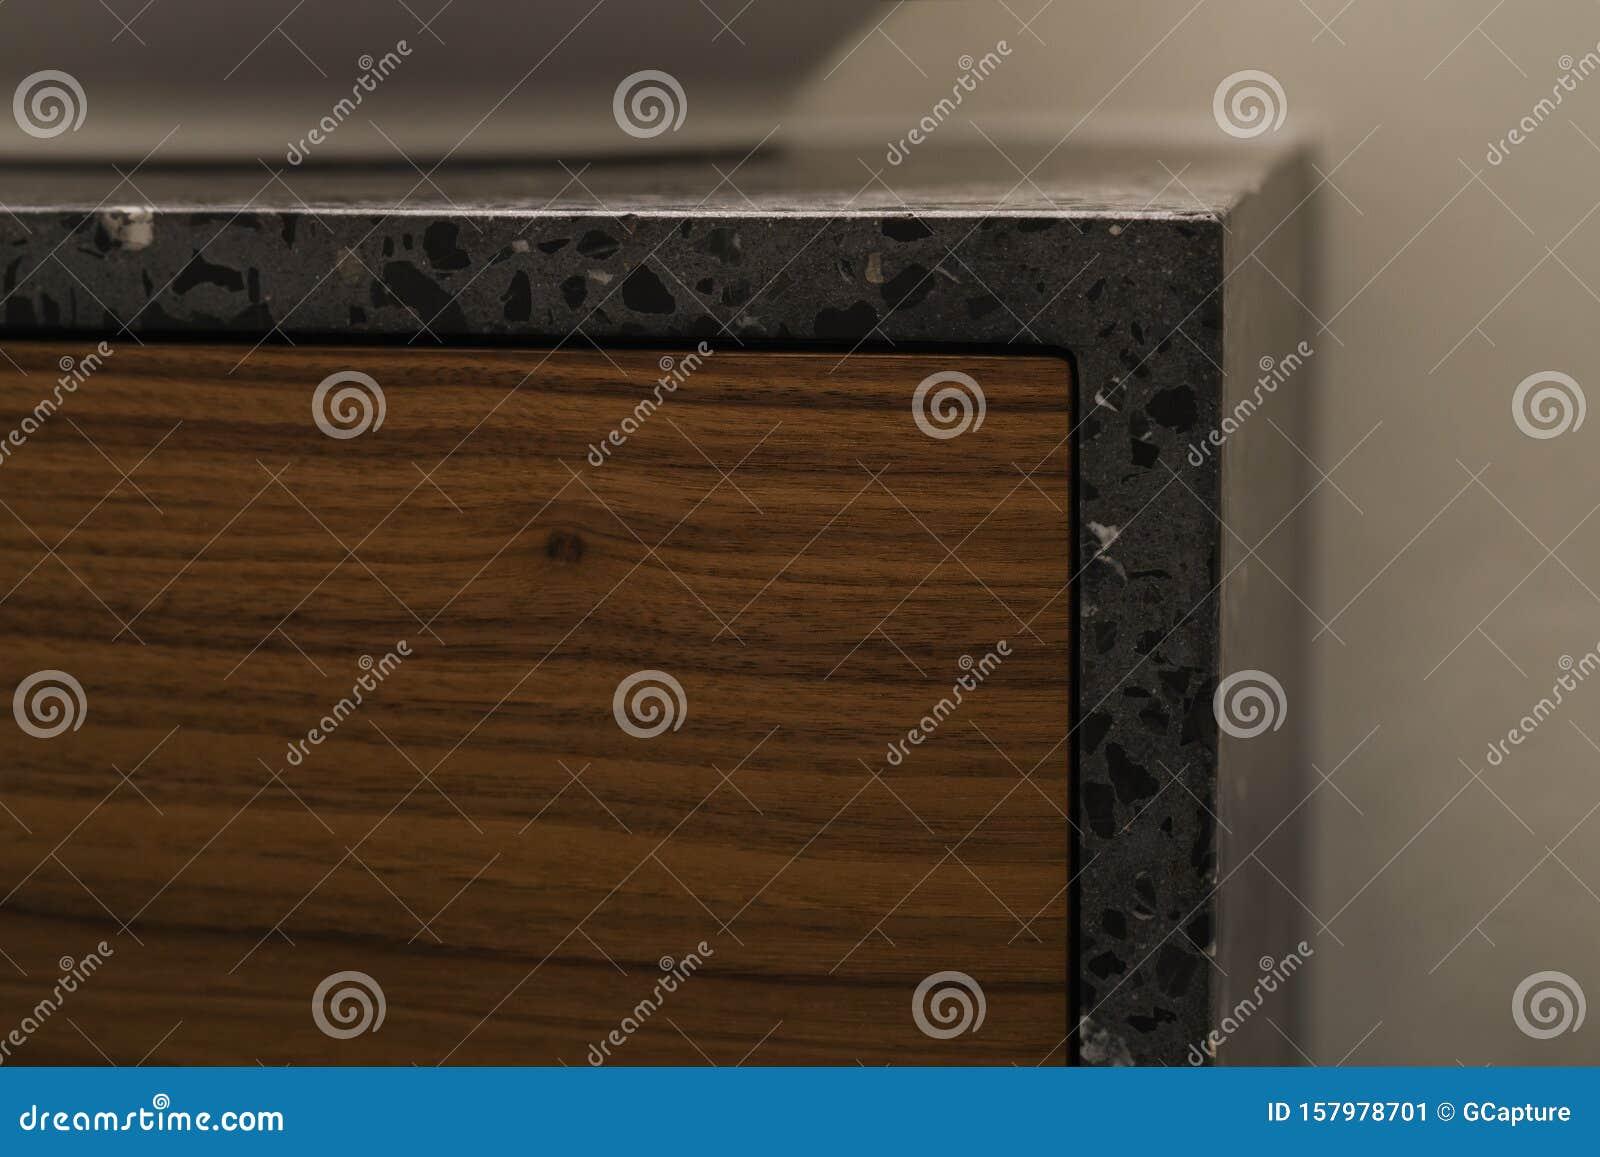 Closeup Detail Shot Of Gray Terrazzo Bathroom Cabinet With Black